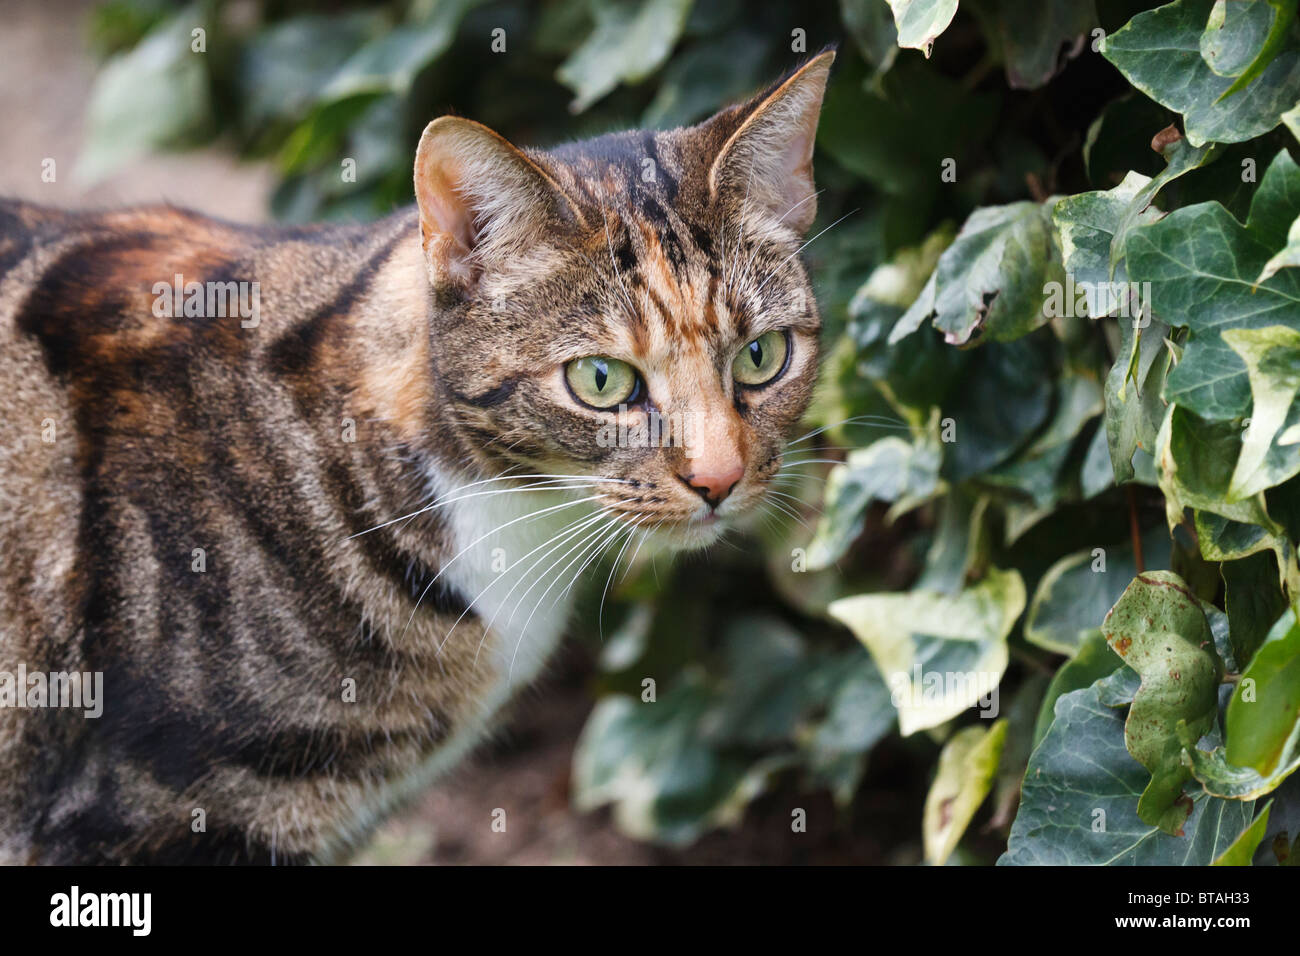 Female Brown Black Tabby Cat Stock Photos Amp Female Brown